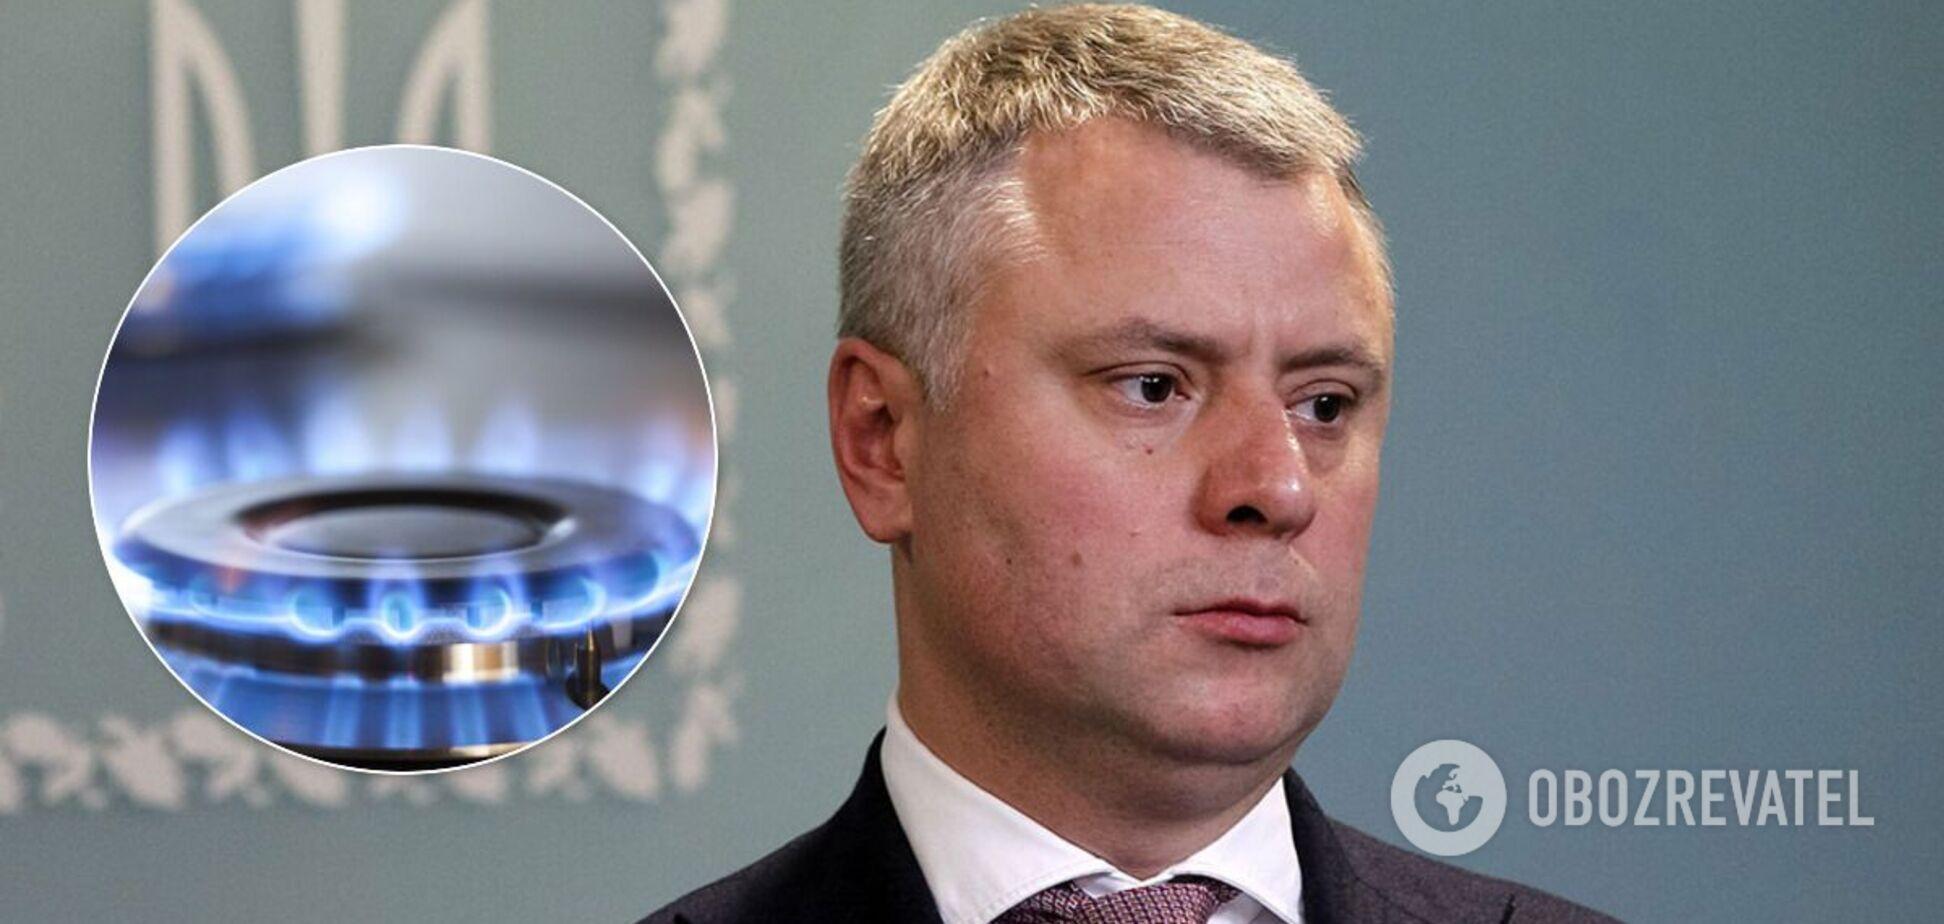 Витренко пояснил цену на газ в 6,99 грн